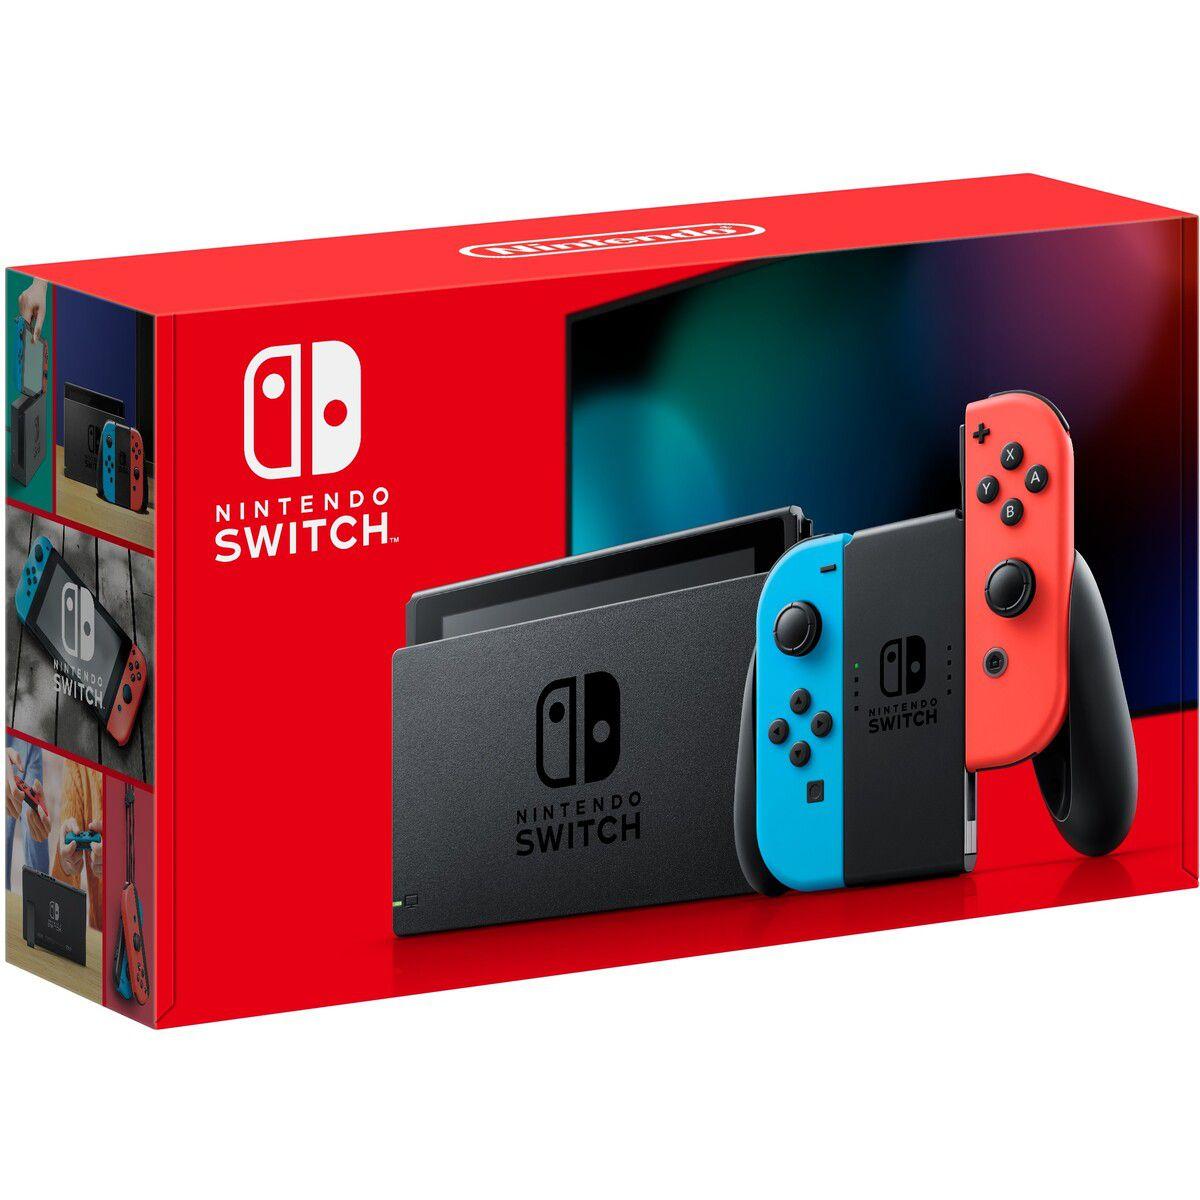 Console Nintendo Switch 32gb